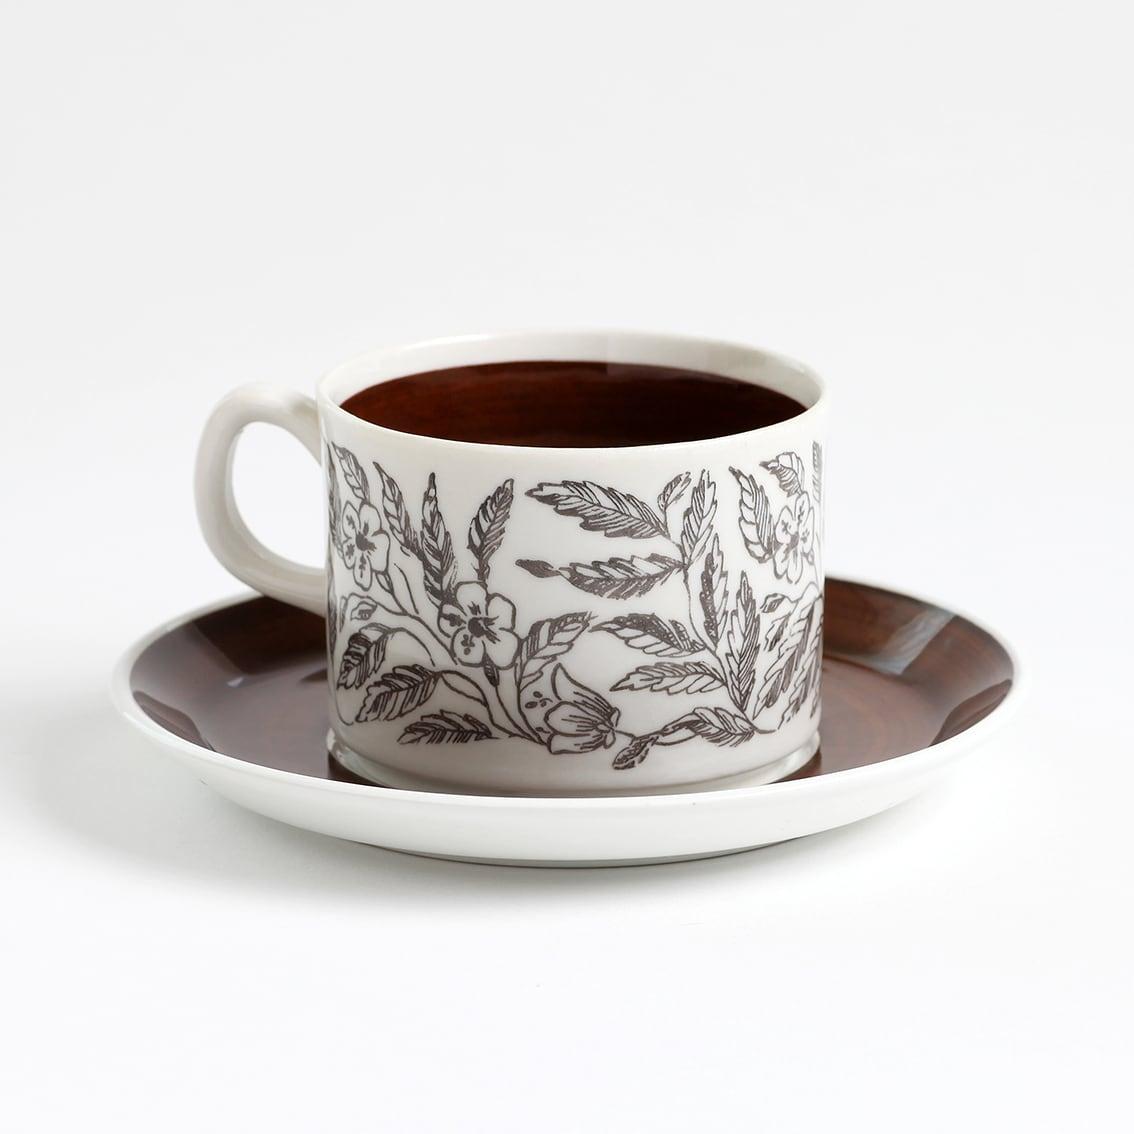 GEFLE ゲフレ Fontana フォンタナ コーヒーカップ&ソーサー - 2 北欧ヴィンテージ ★わけあり★